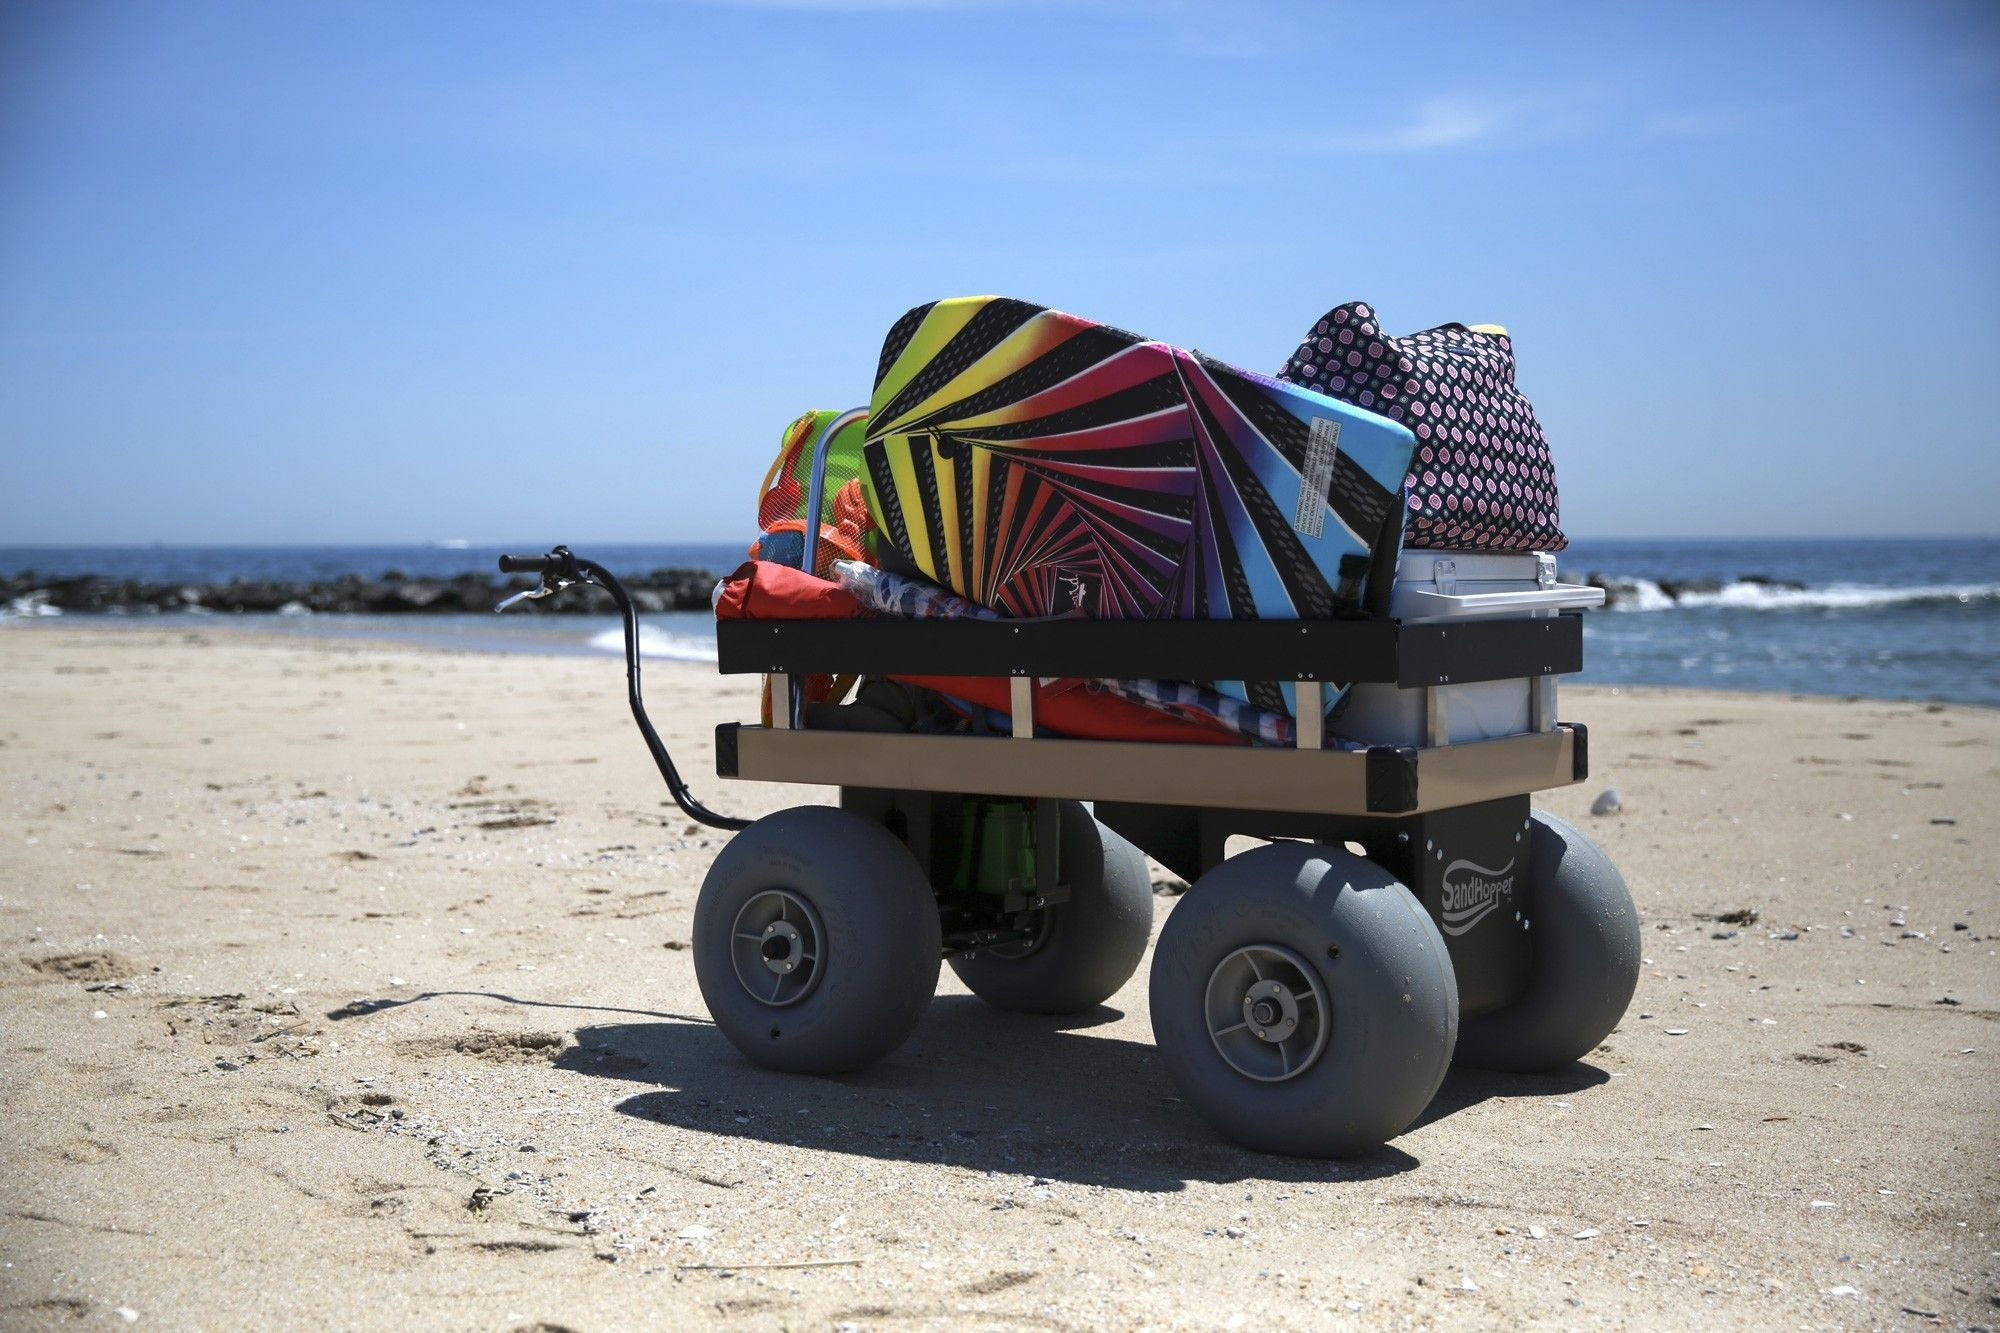 24 X 48 With Images Beach Cart Beach Wagon Electric Beach